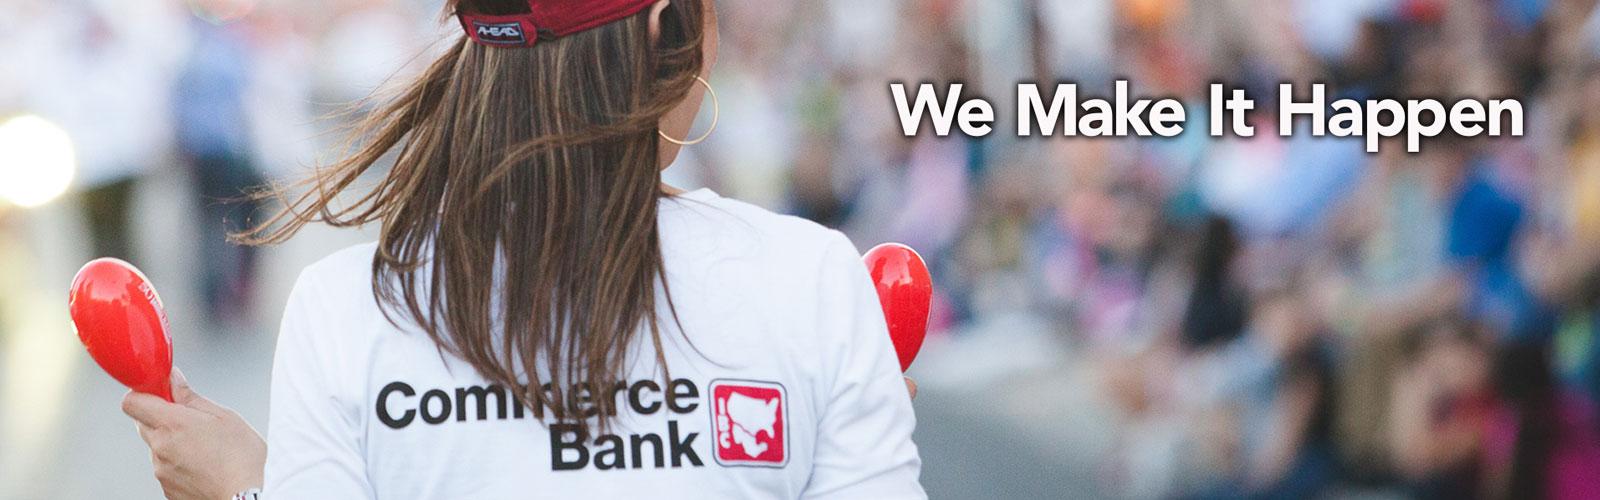 commerce-bank-we-make-it-happen